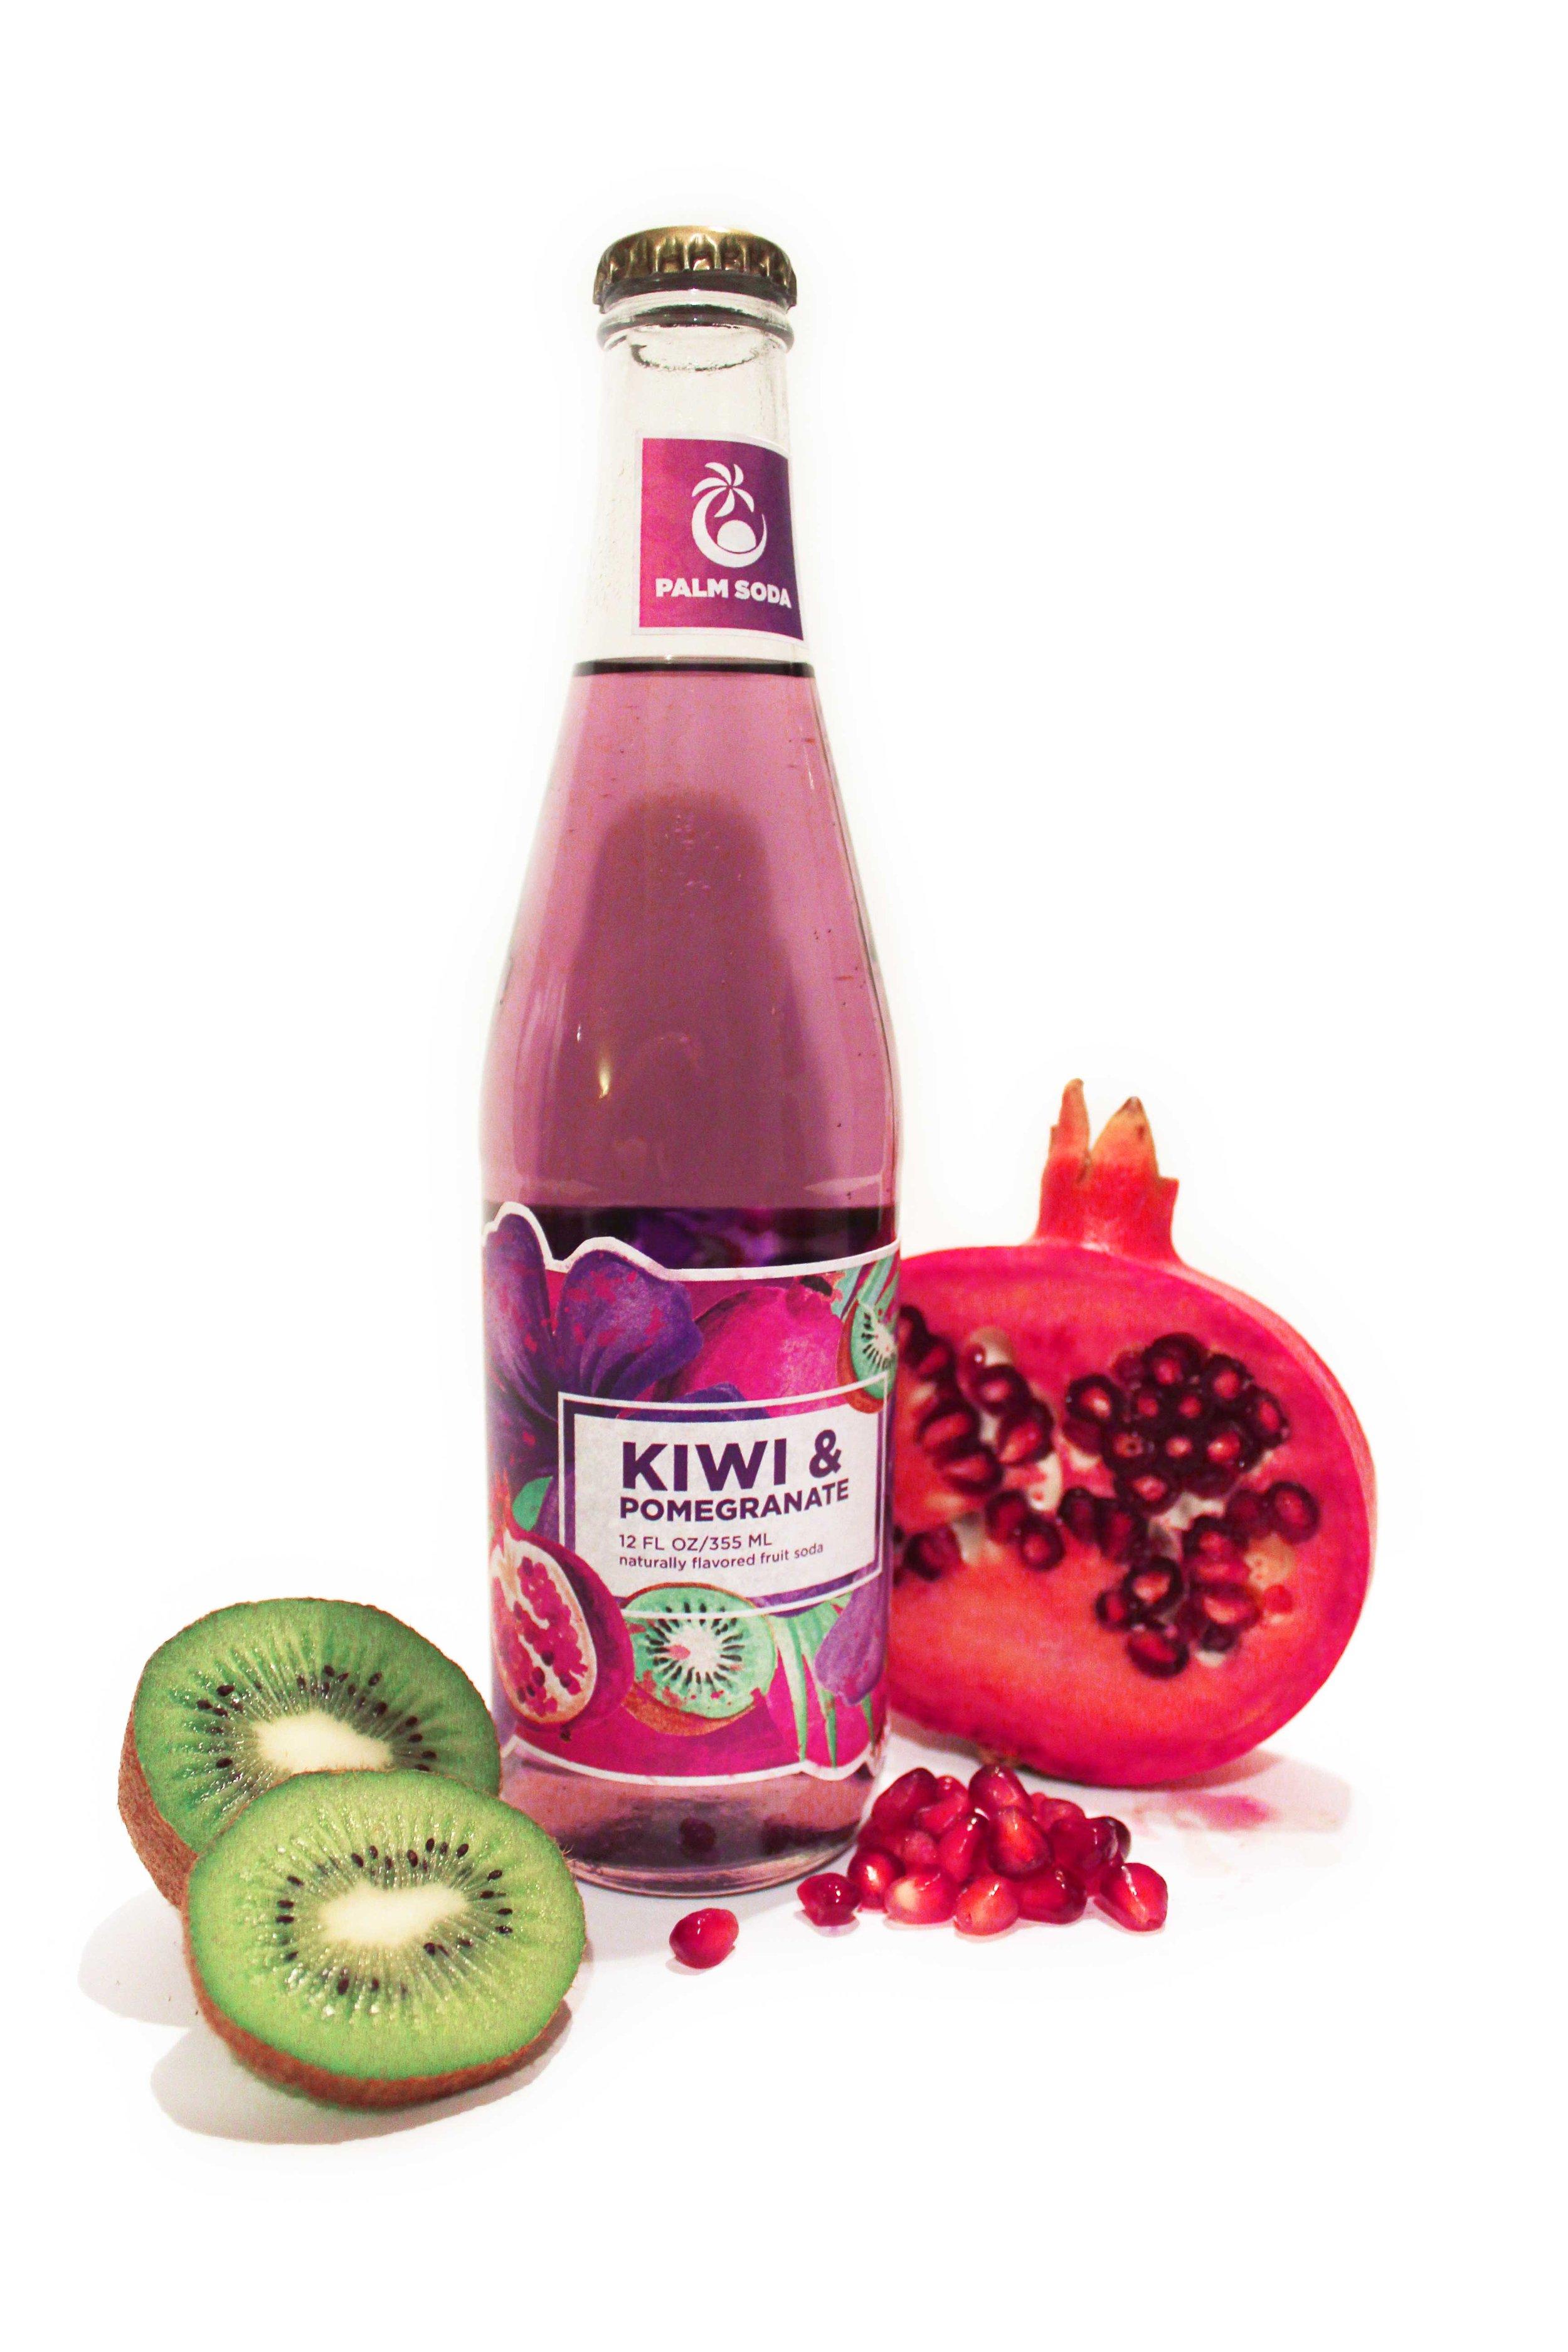 Kiwi Pomegranate Palm Soda